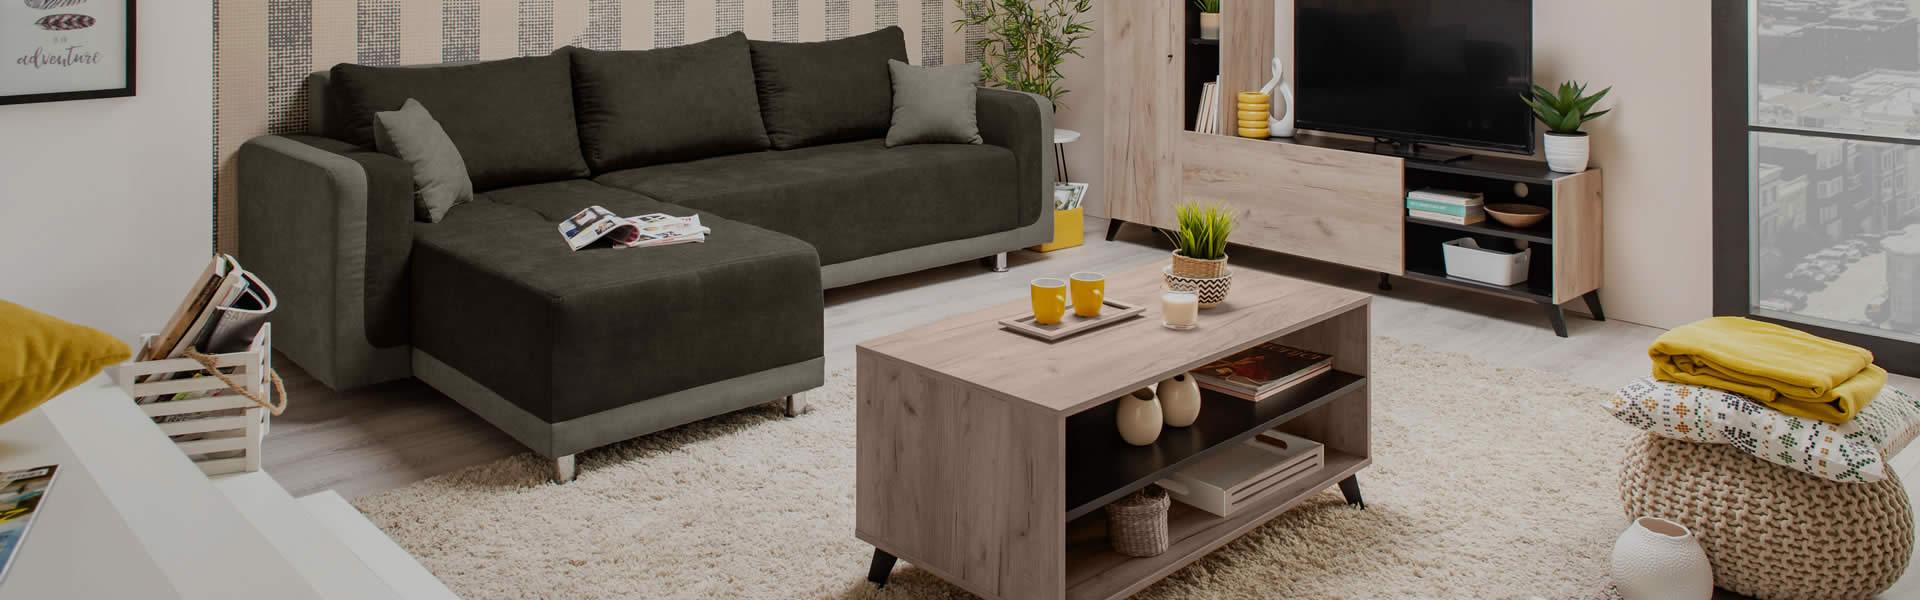 Steptoes Furniture world New Arrivals slider cyprus 3